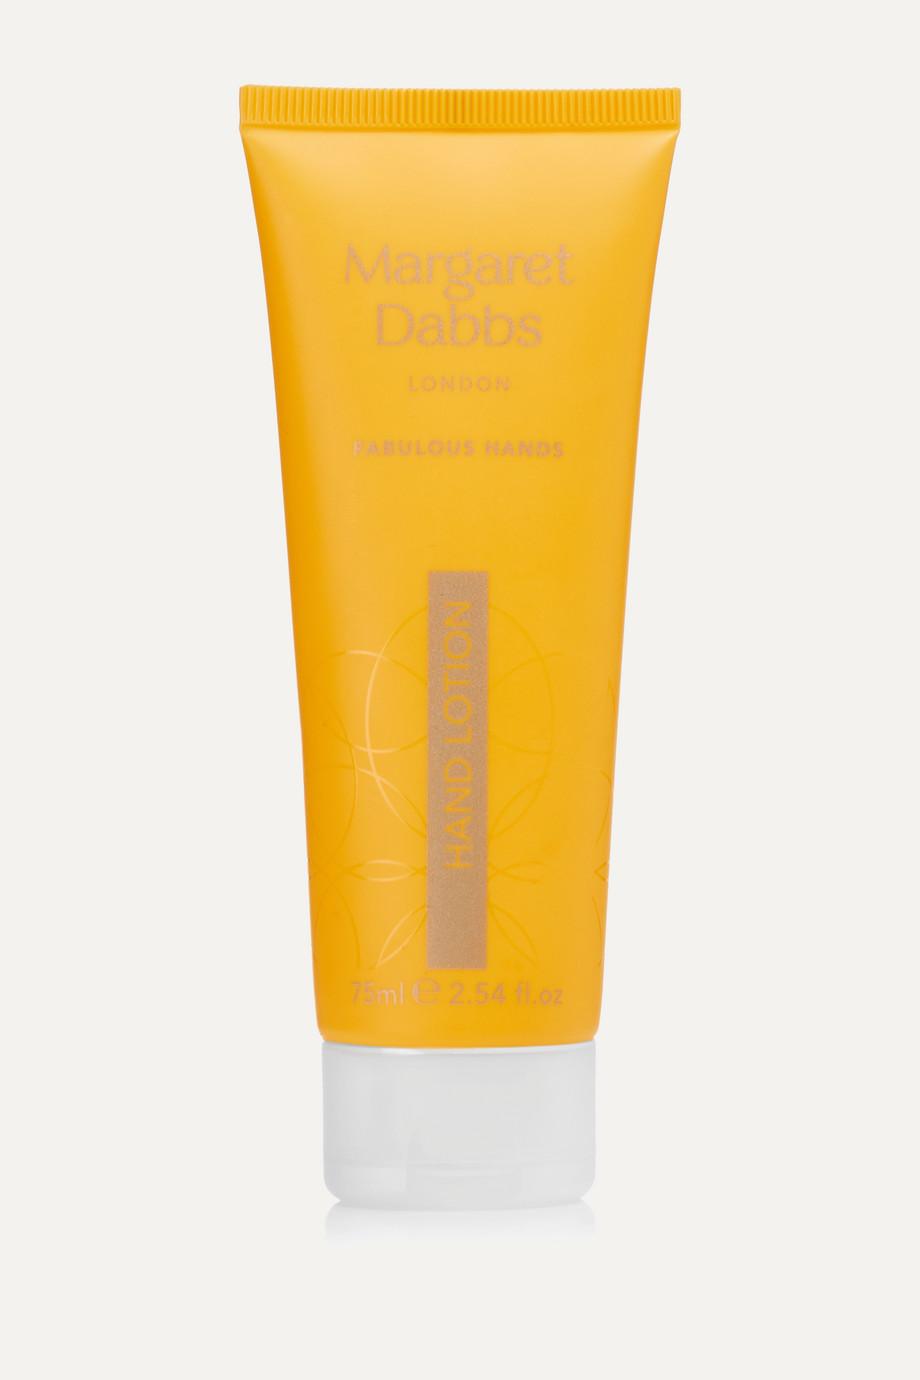 Margaret Dabbs London Intensive Hydrating Hand Lotion, 75 ml – Handcreme